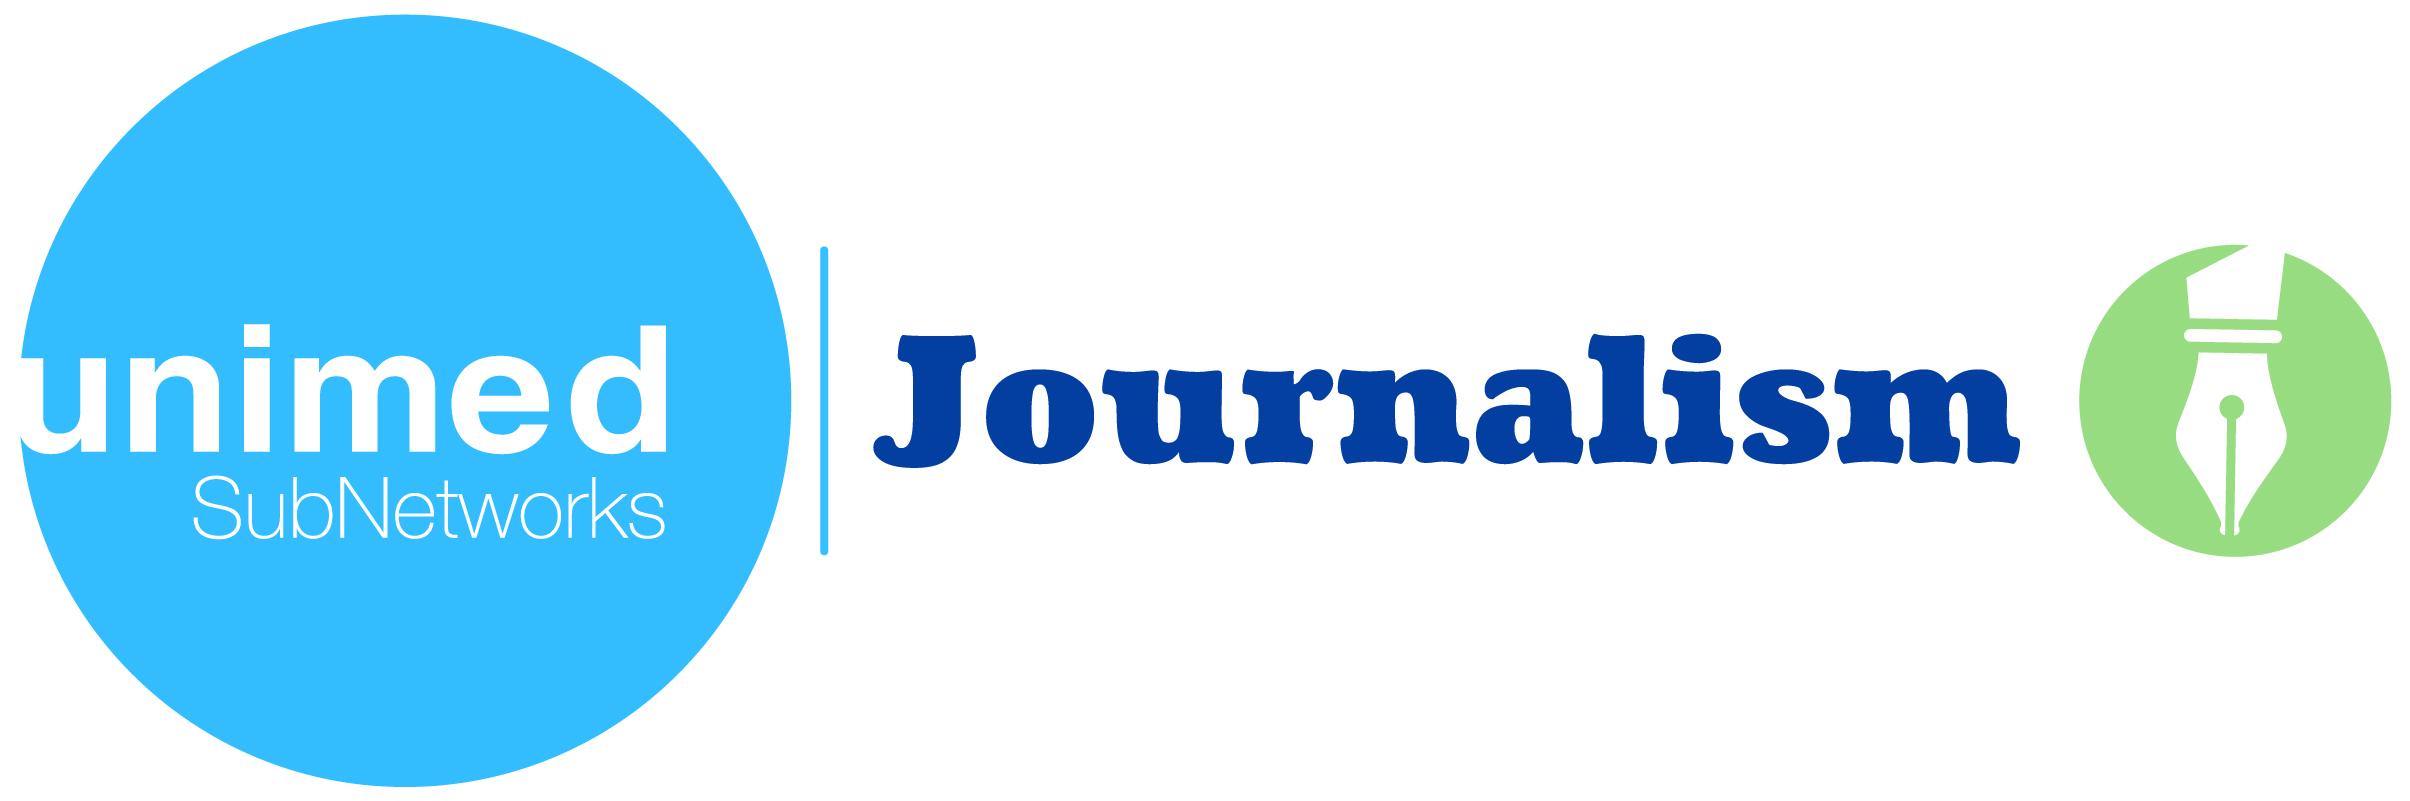 SB-Journalism-Color_Tavola disegno 1